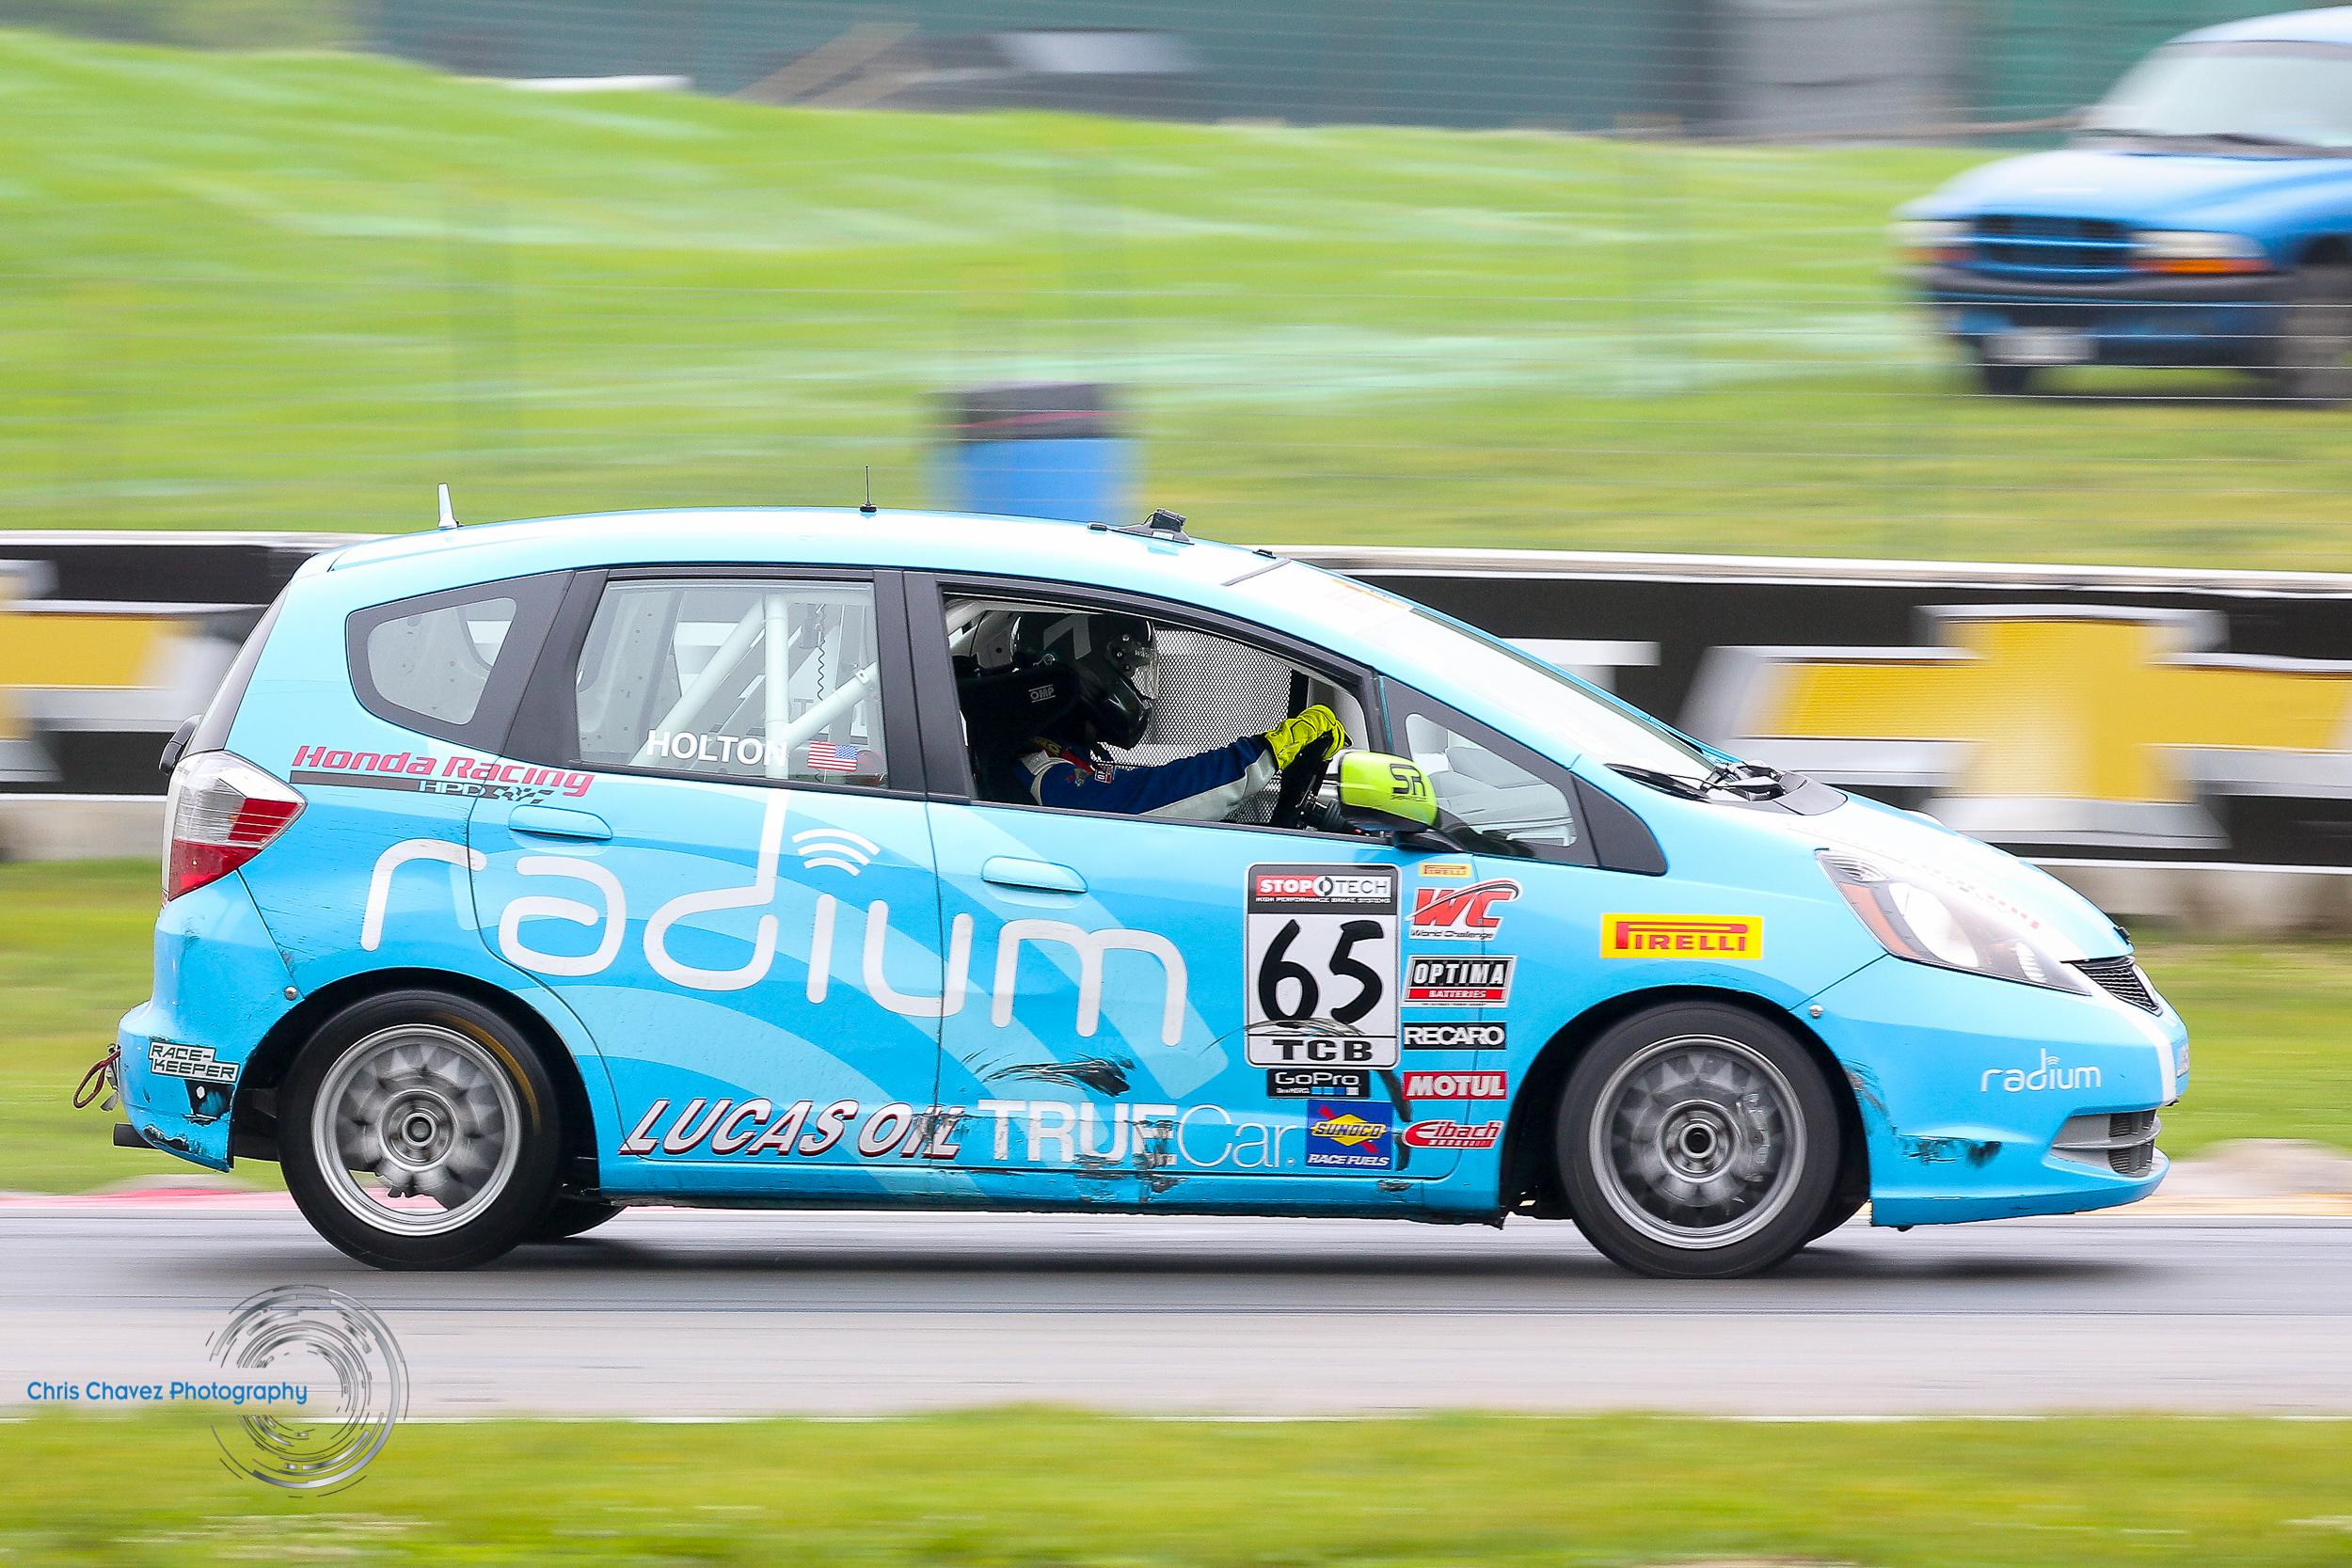 #65 Paul Holton - Radium - Honda Fit - First Place TCB Class